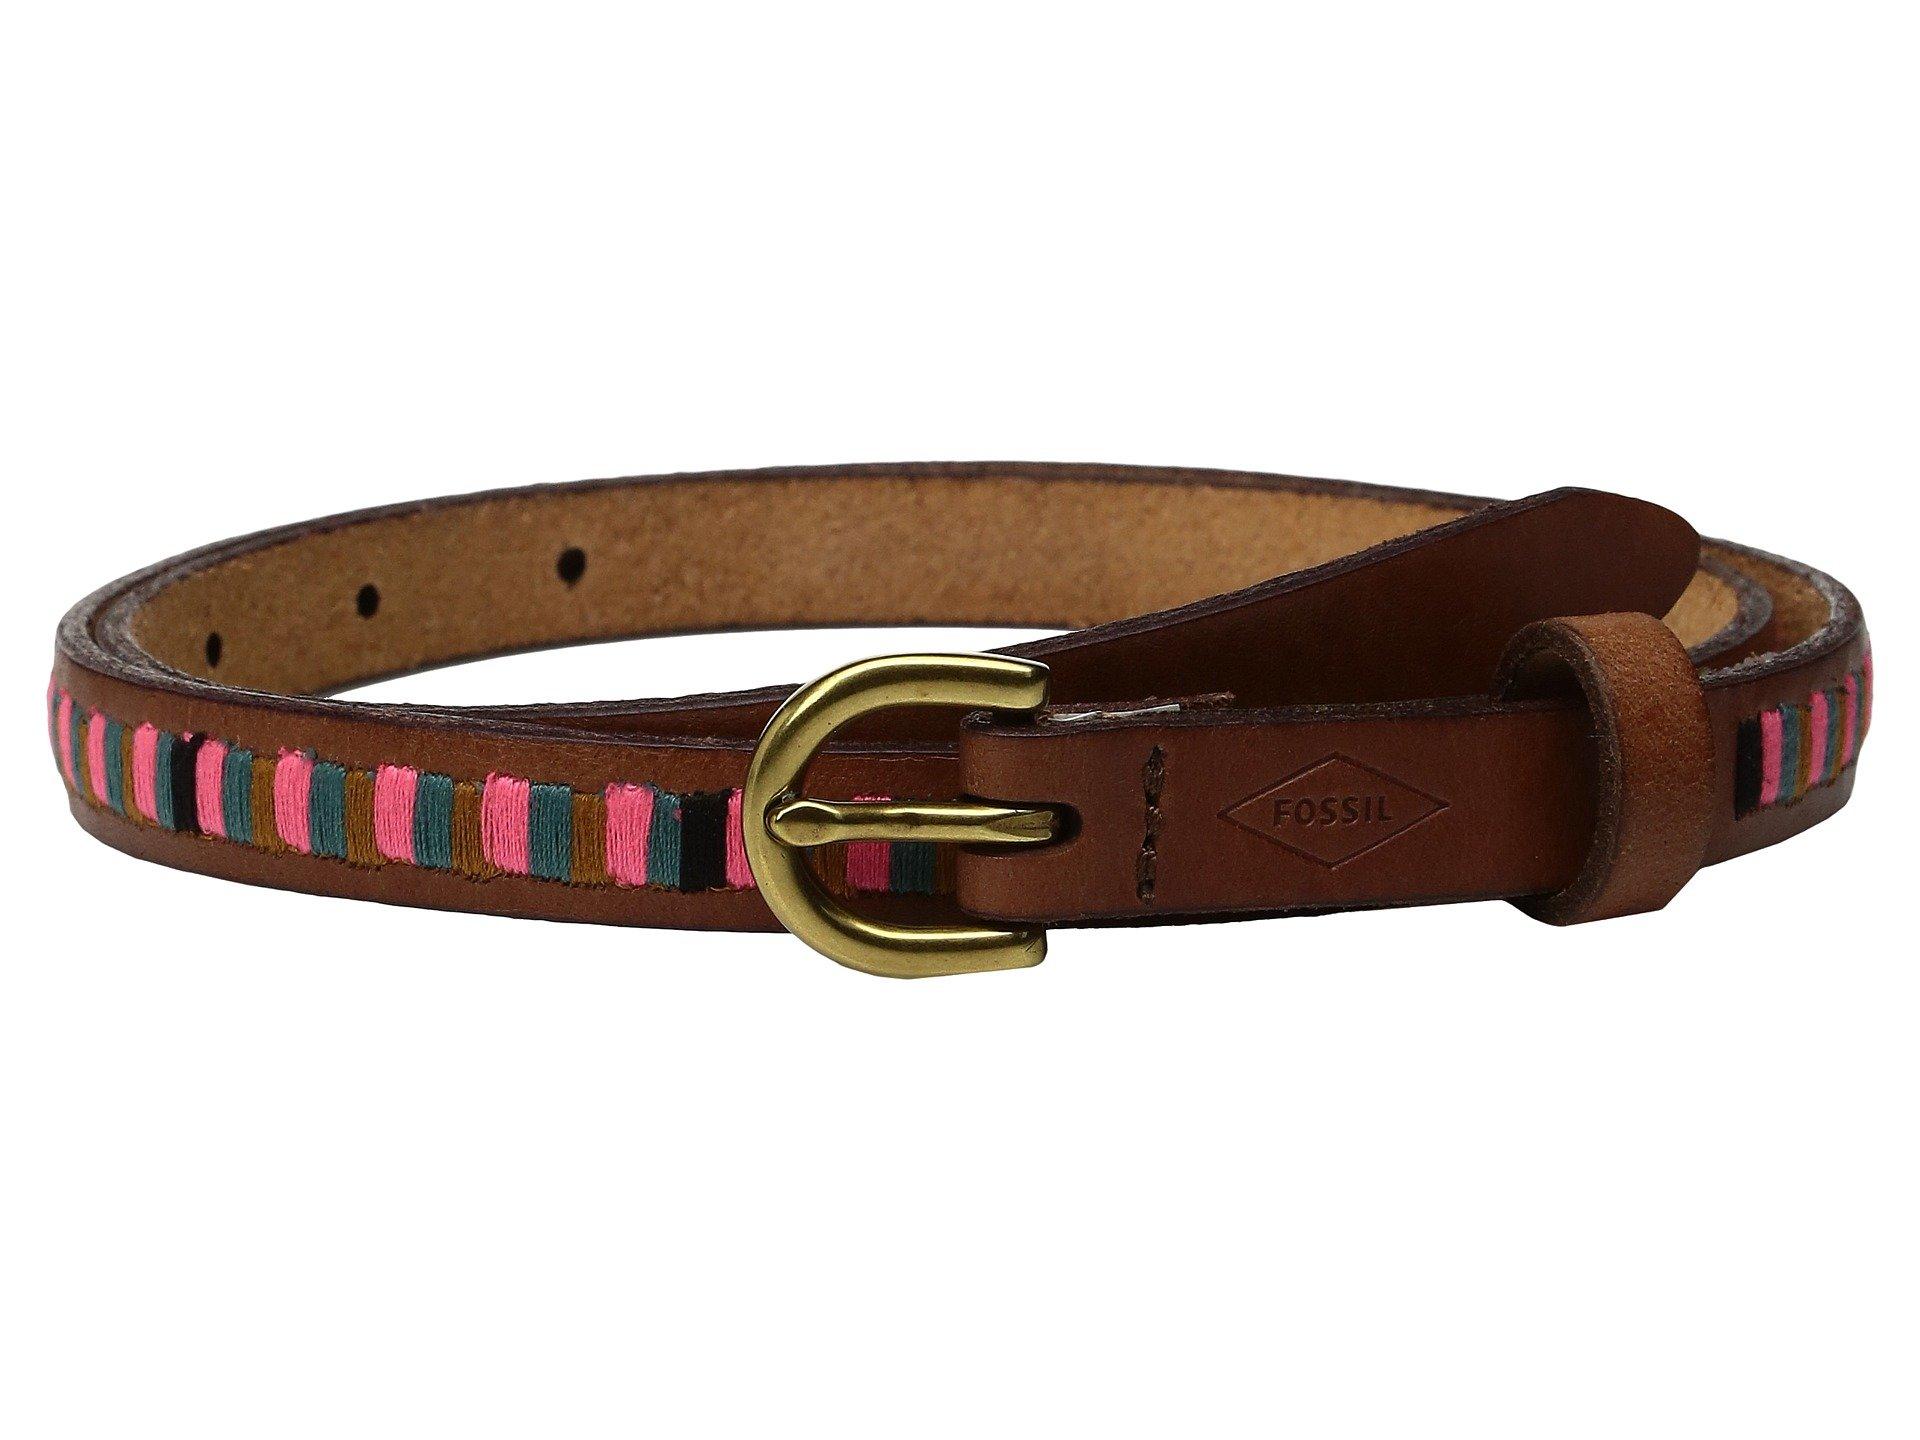 Correa o Cinturon para Mujer Fossil Embroidered Stripe Belt  + Fossil en VeoyCompro.net